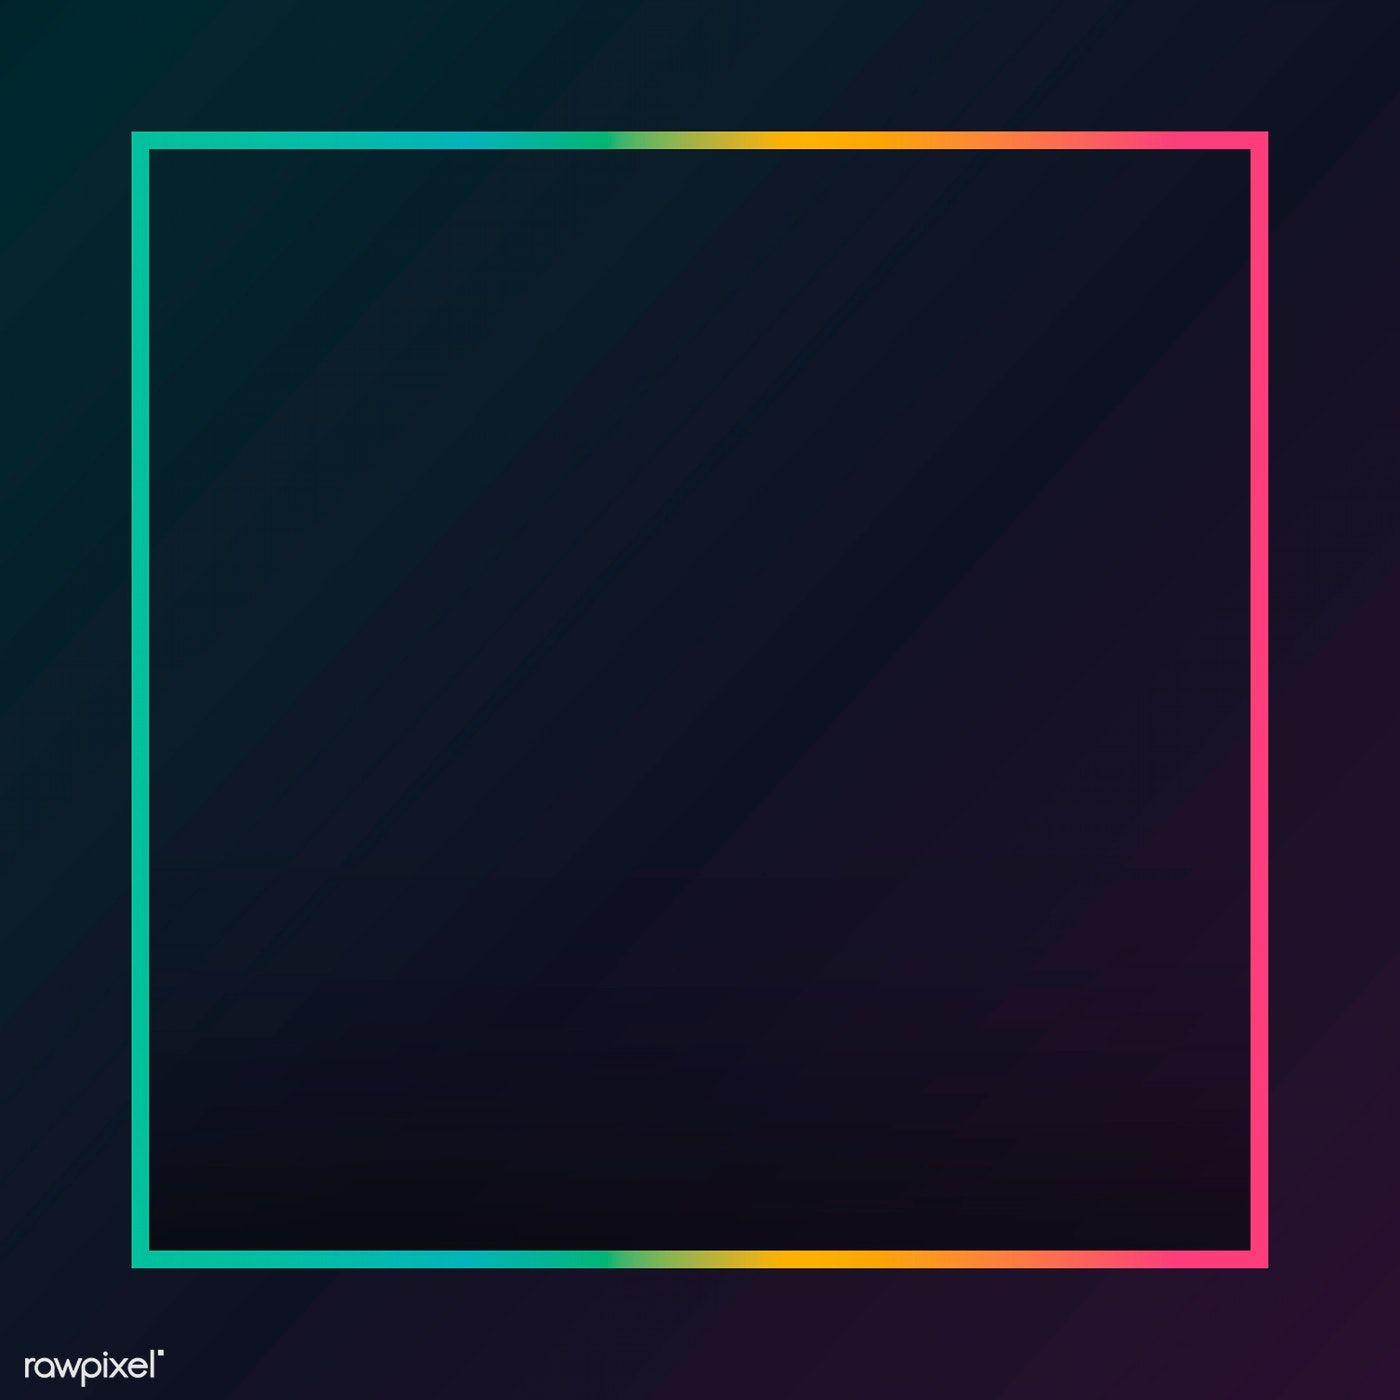 Download premium vector of Gradient border black